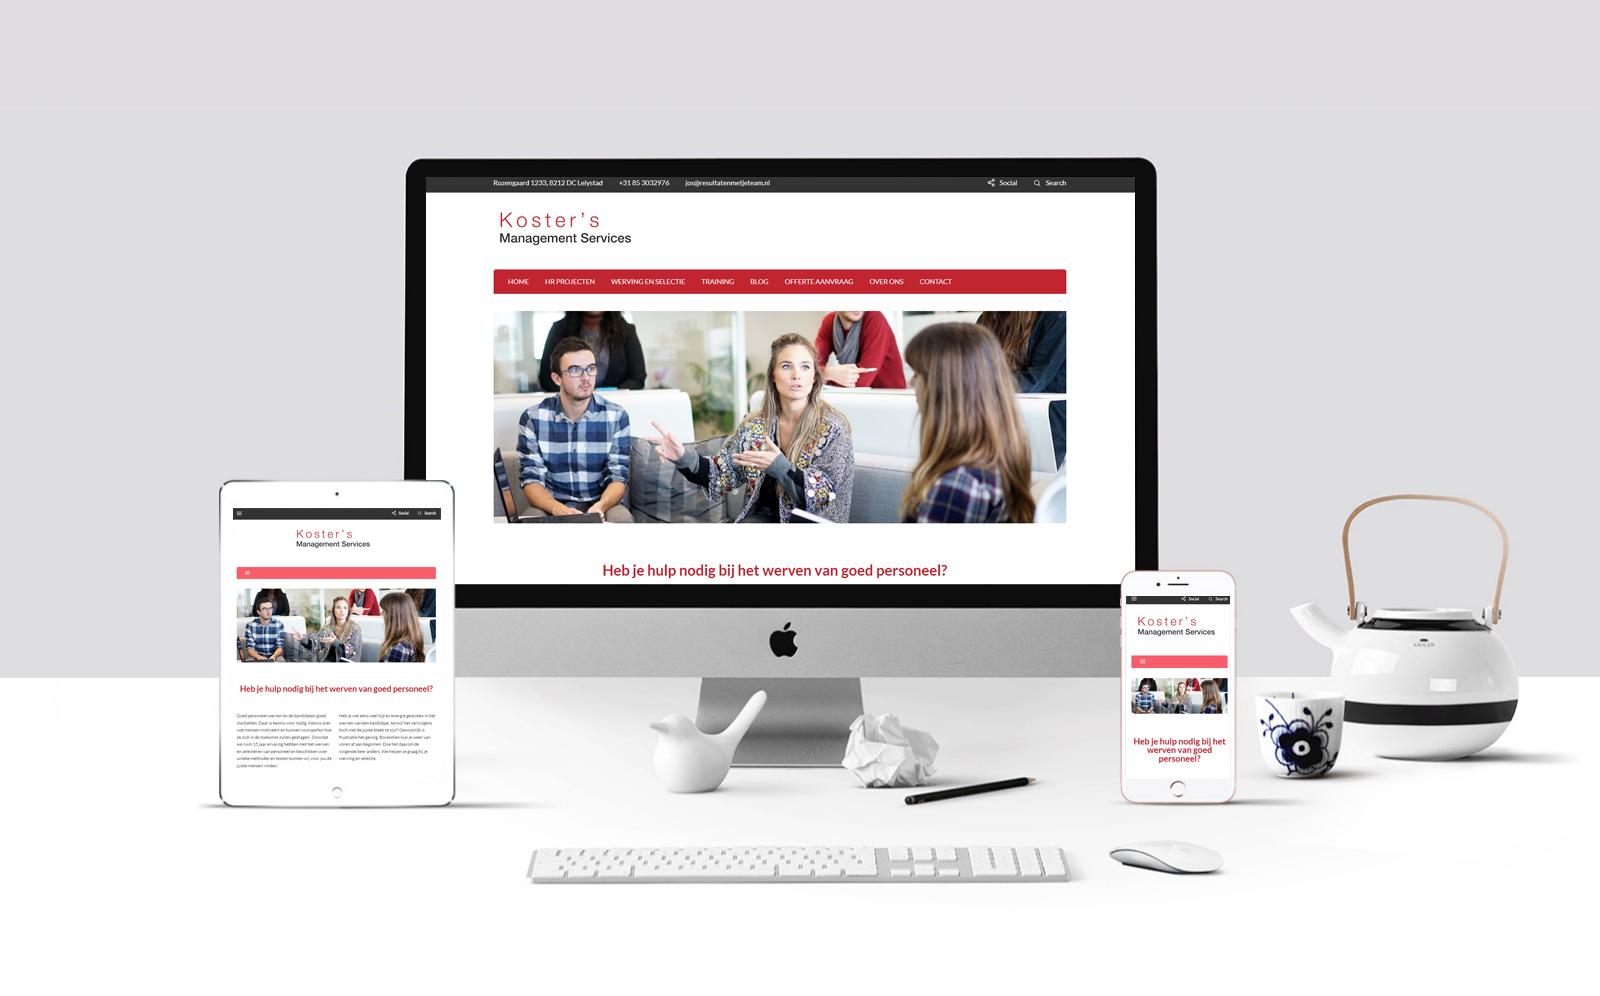 Koster's management services – september 2017